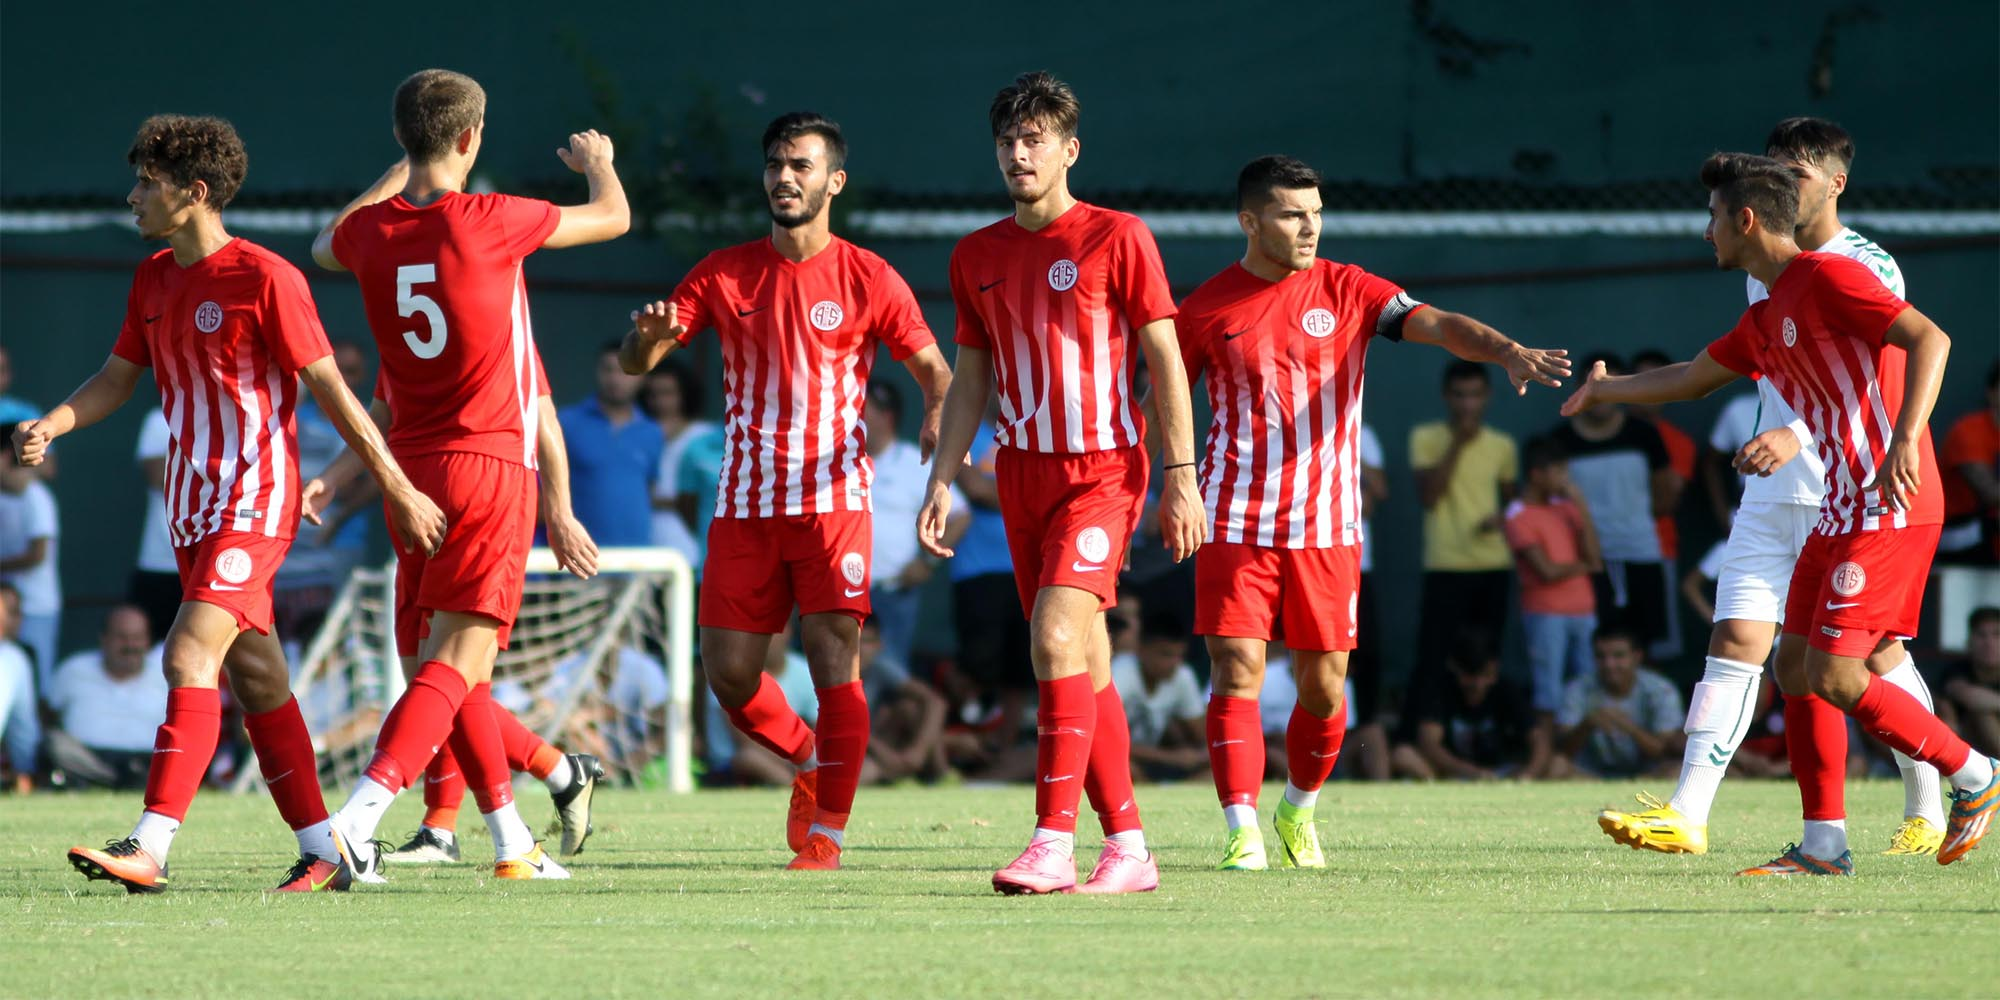 Gençler A.Konyaspor'u Devirdi